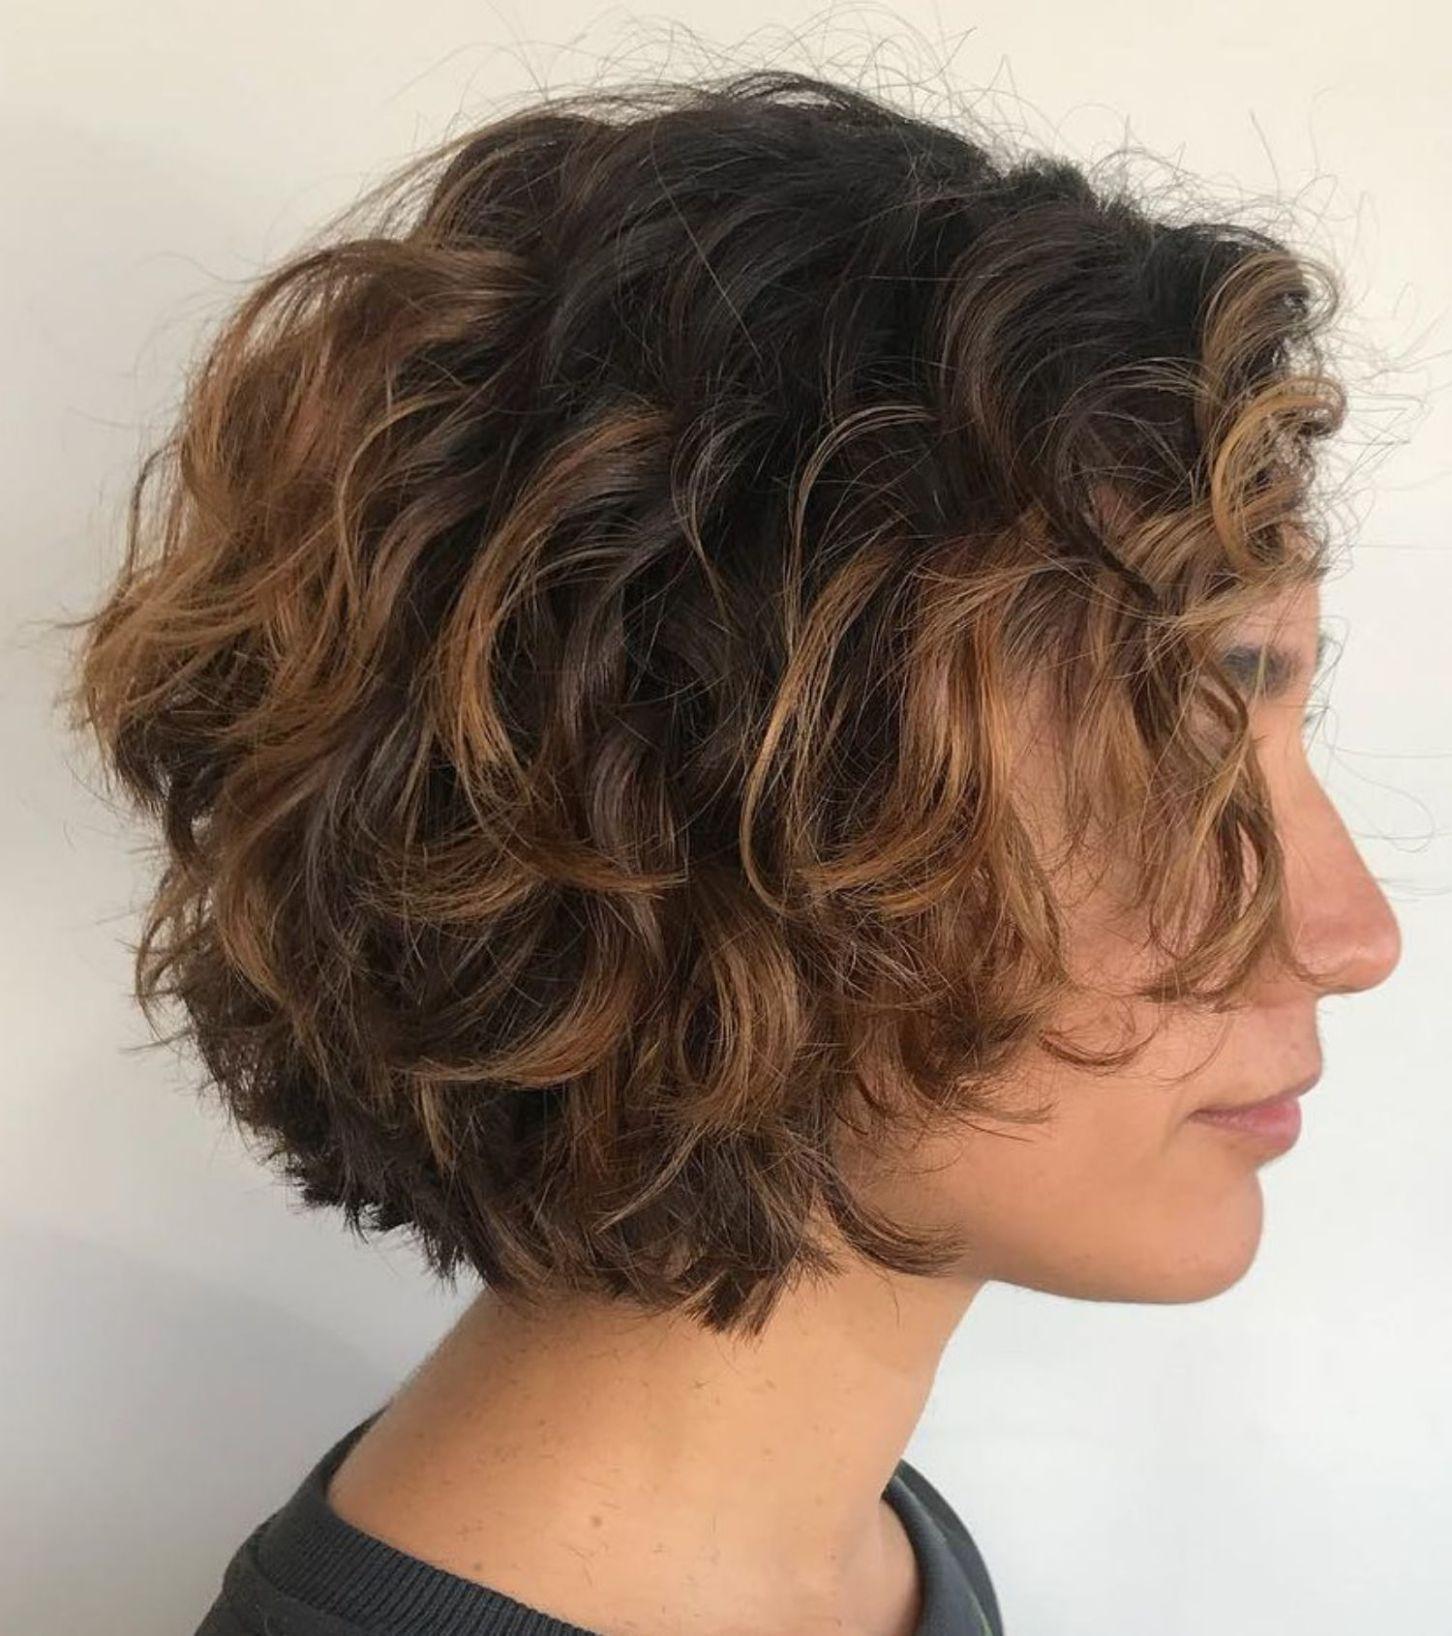 12 Most Delightful Short Wavy Hairstyles  Short wavy hair, Short